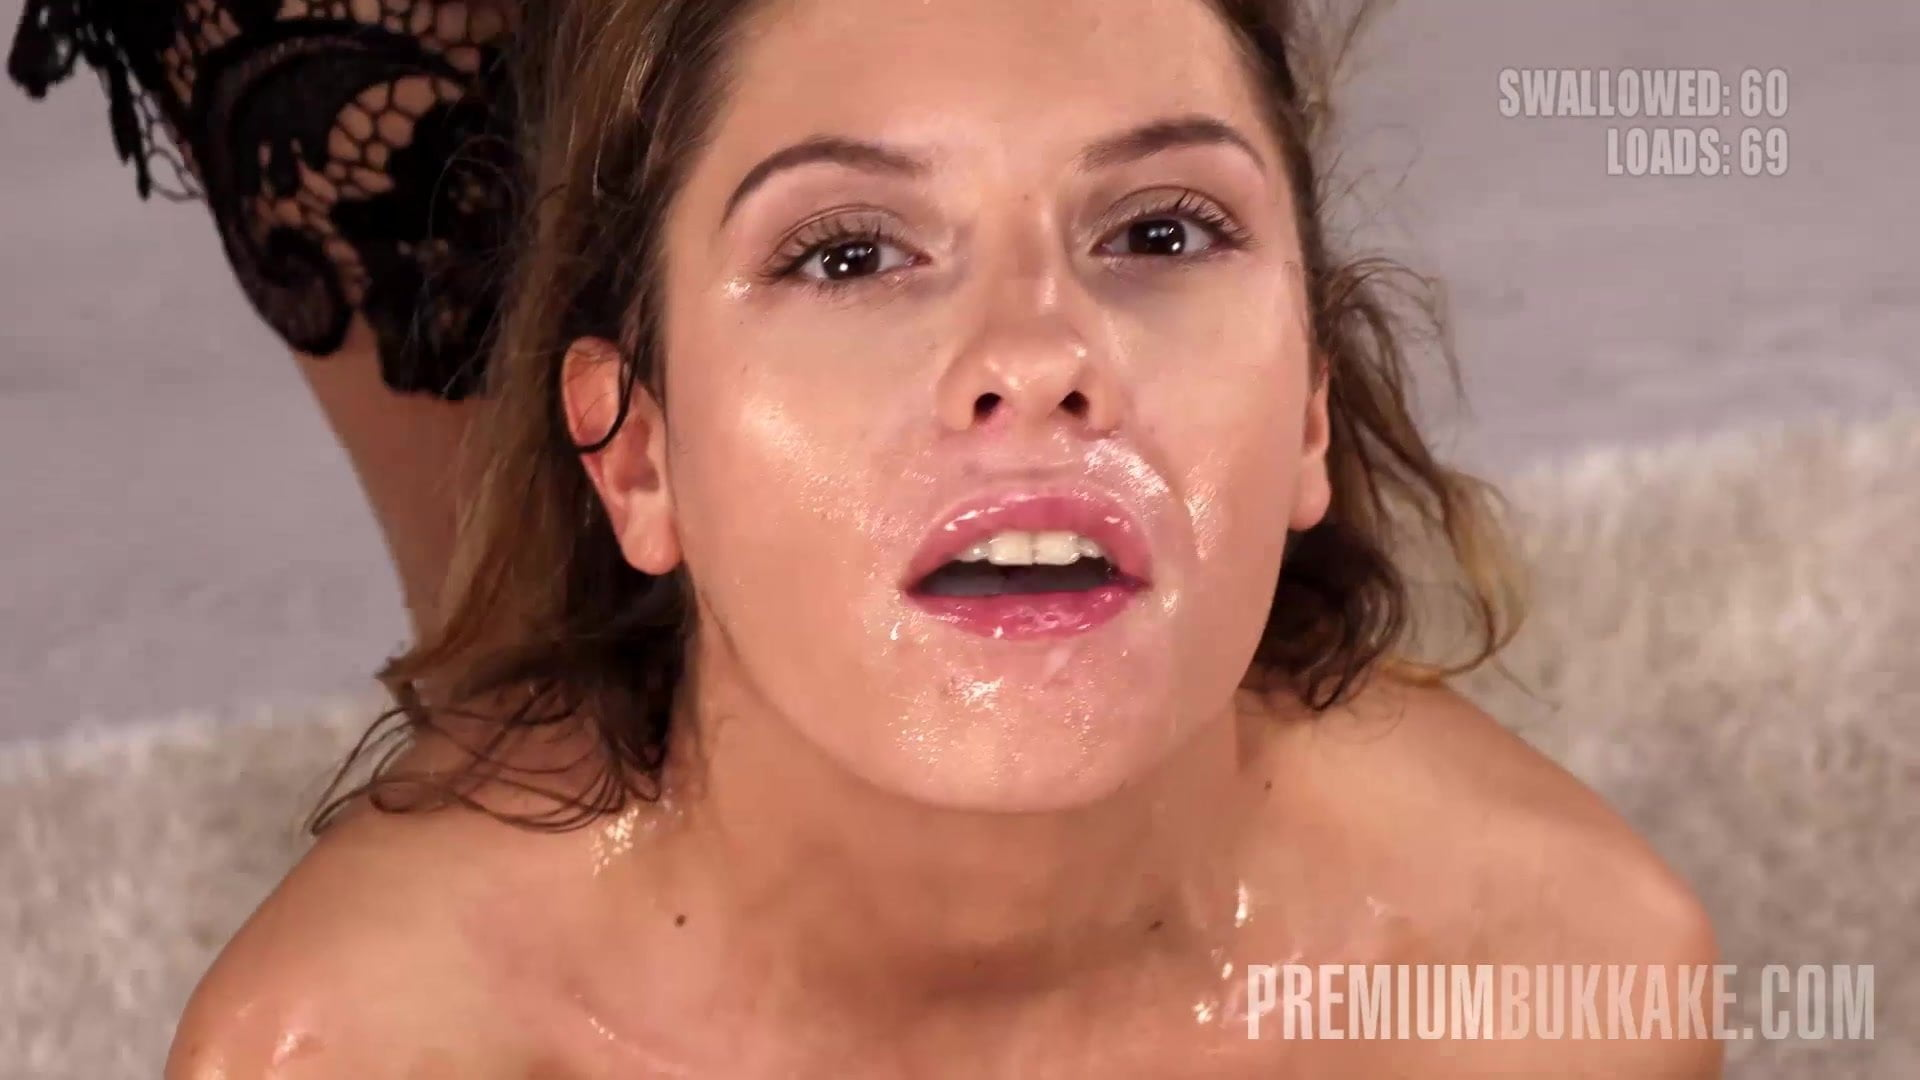 Girls do you enjoy anal sex